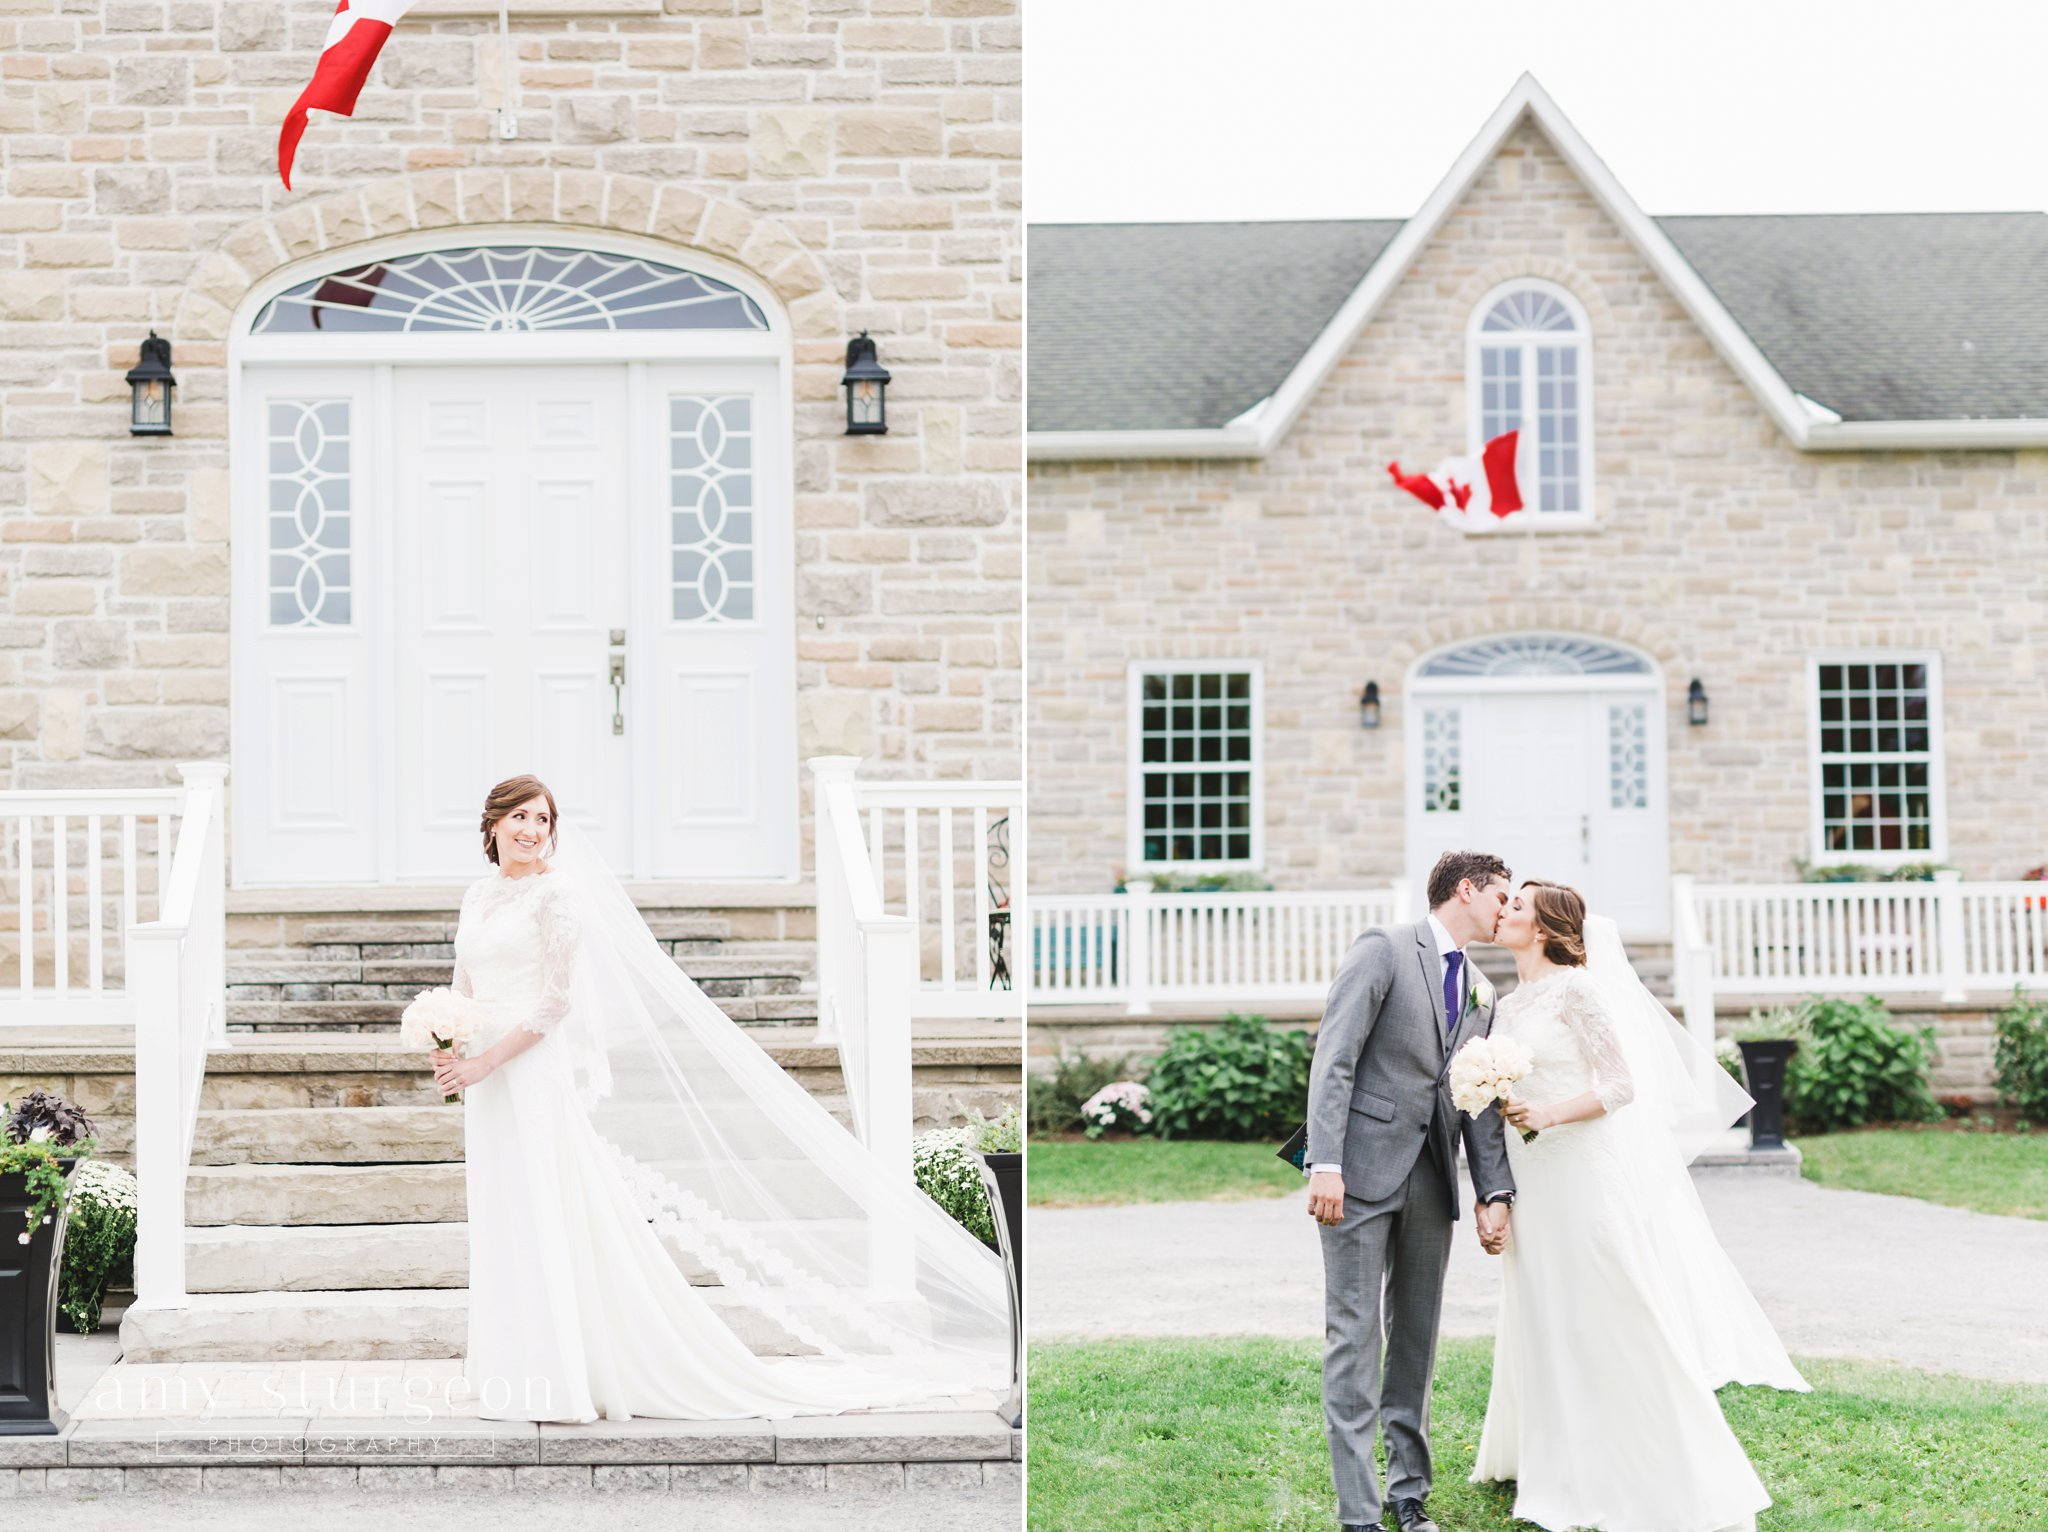 Cathedral veil at the alpaca farm wedding